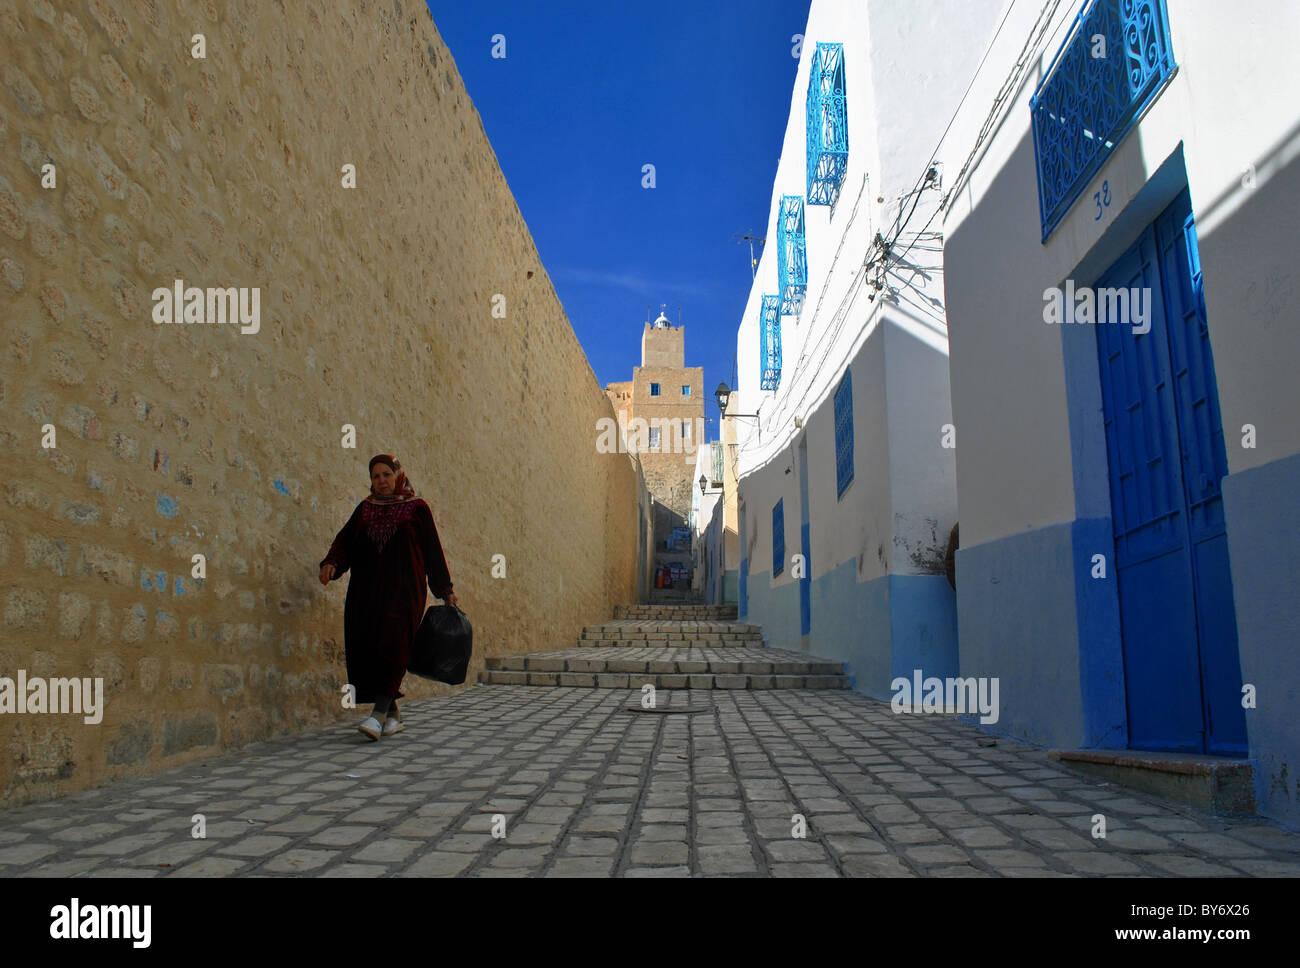 Woman walking down a street in Sousse medina, Tunisia - Stock Image